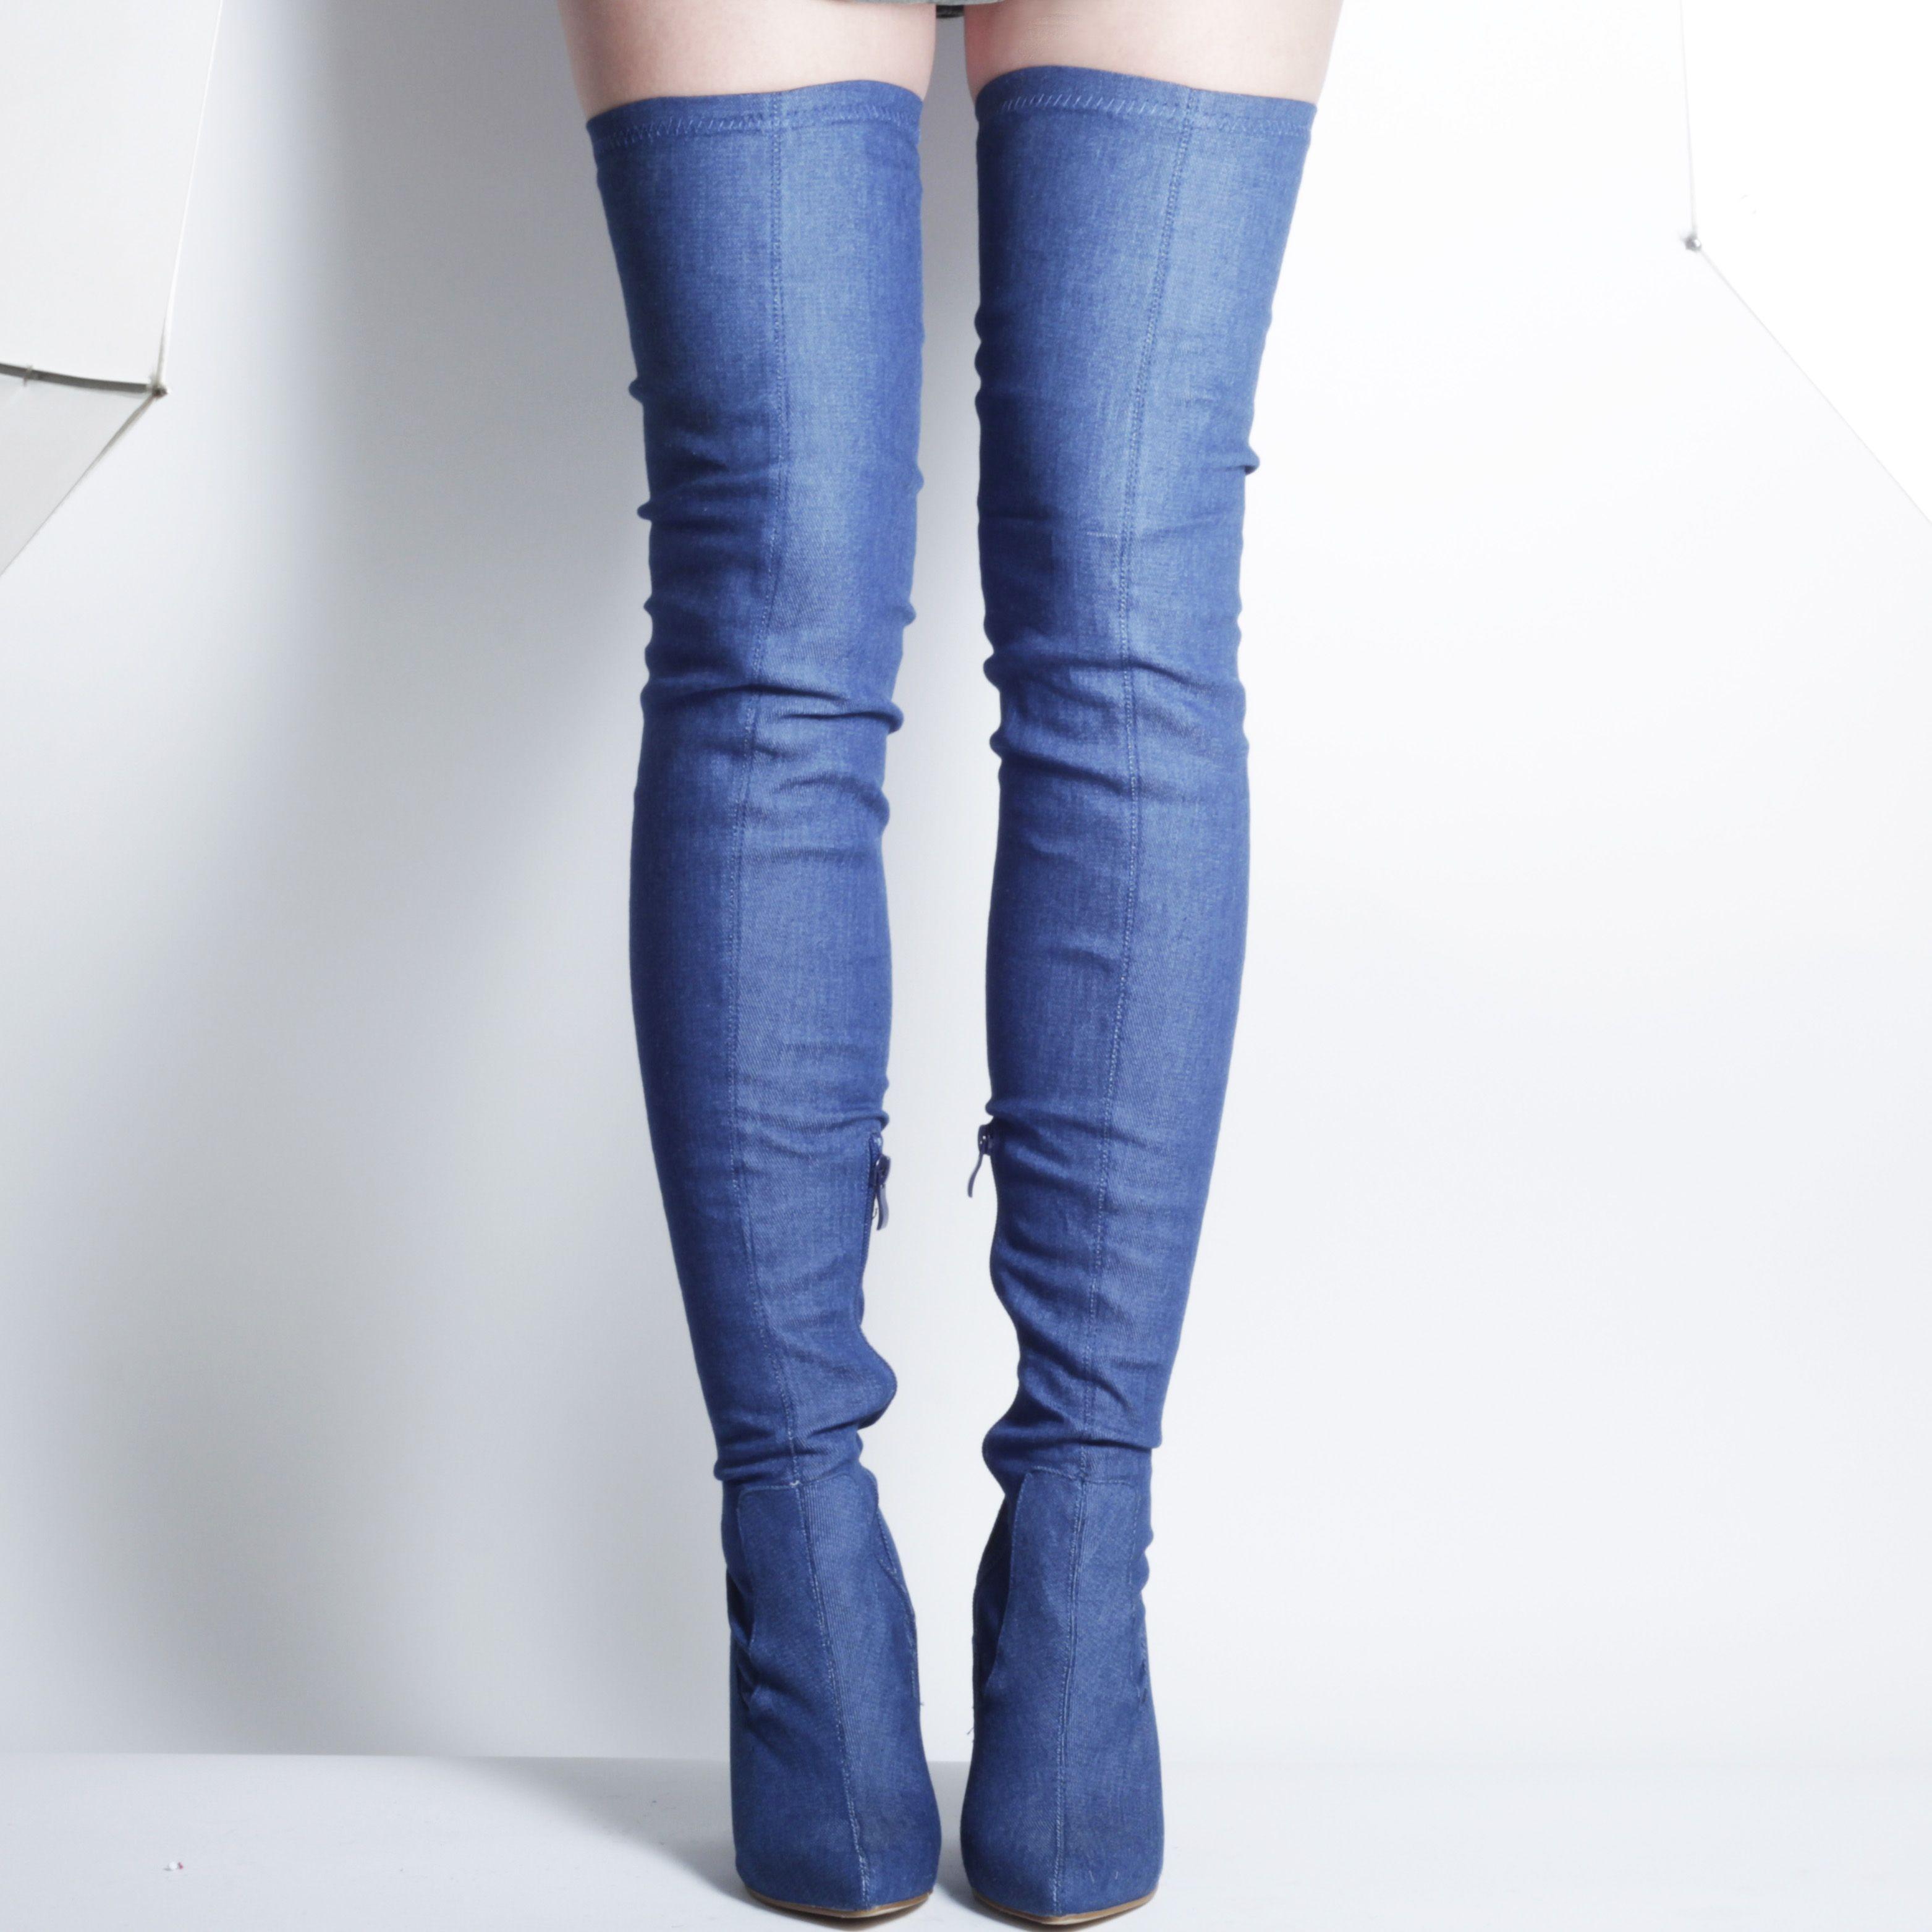 946b5b67705c Korky s WHAM1 Denim Knee Hight boots (It s Britney Bitch boots).   kneehighboots  overthekneeboots  denimboots  denim  korkys  korkysshoes